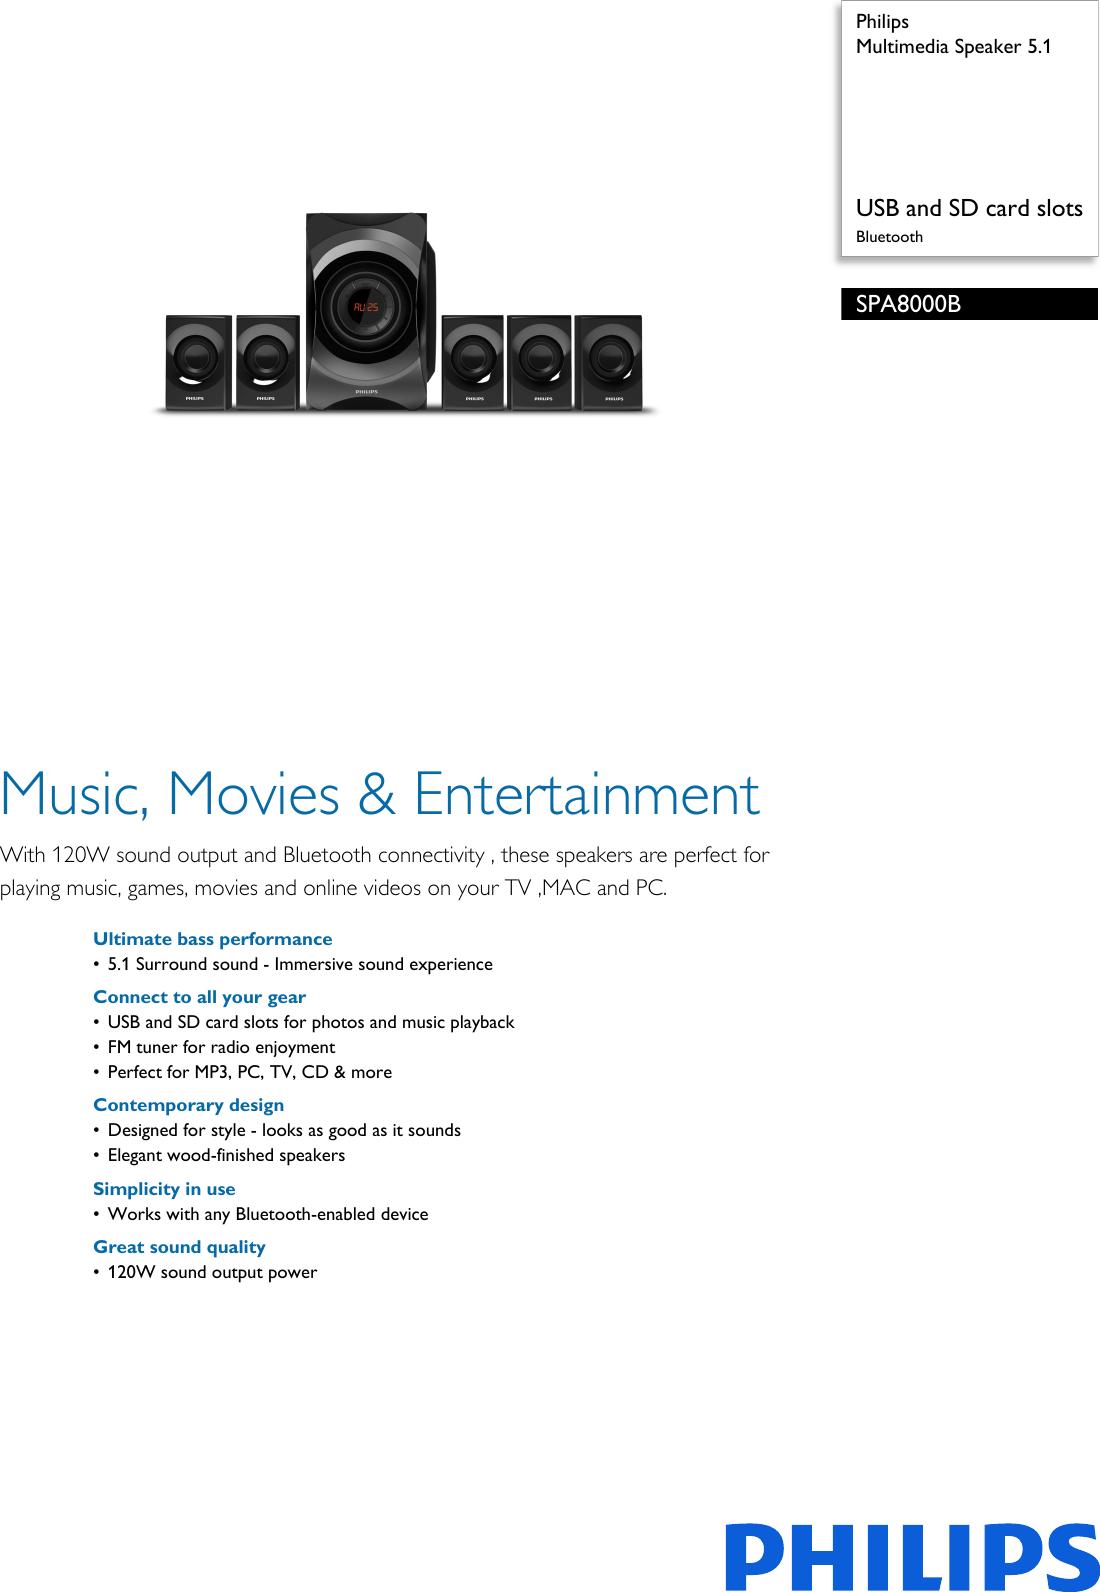 Philips SPA8000B/94 Multimedia Speaker 5 1 User Manual